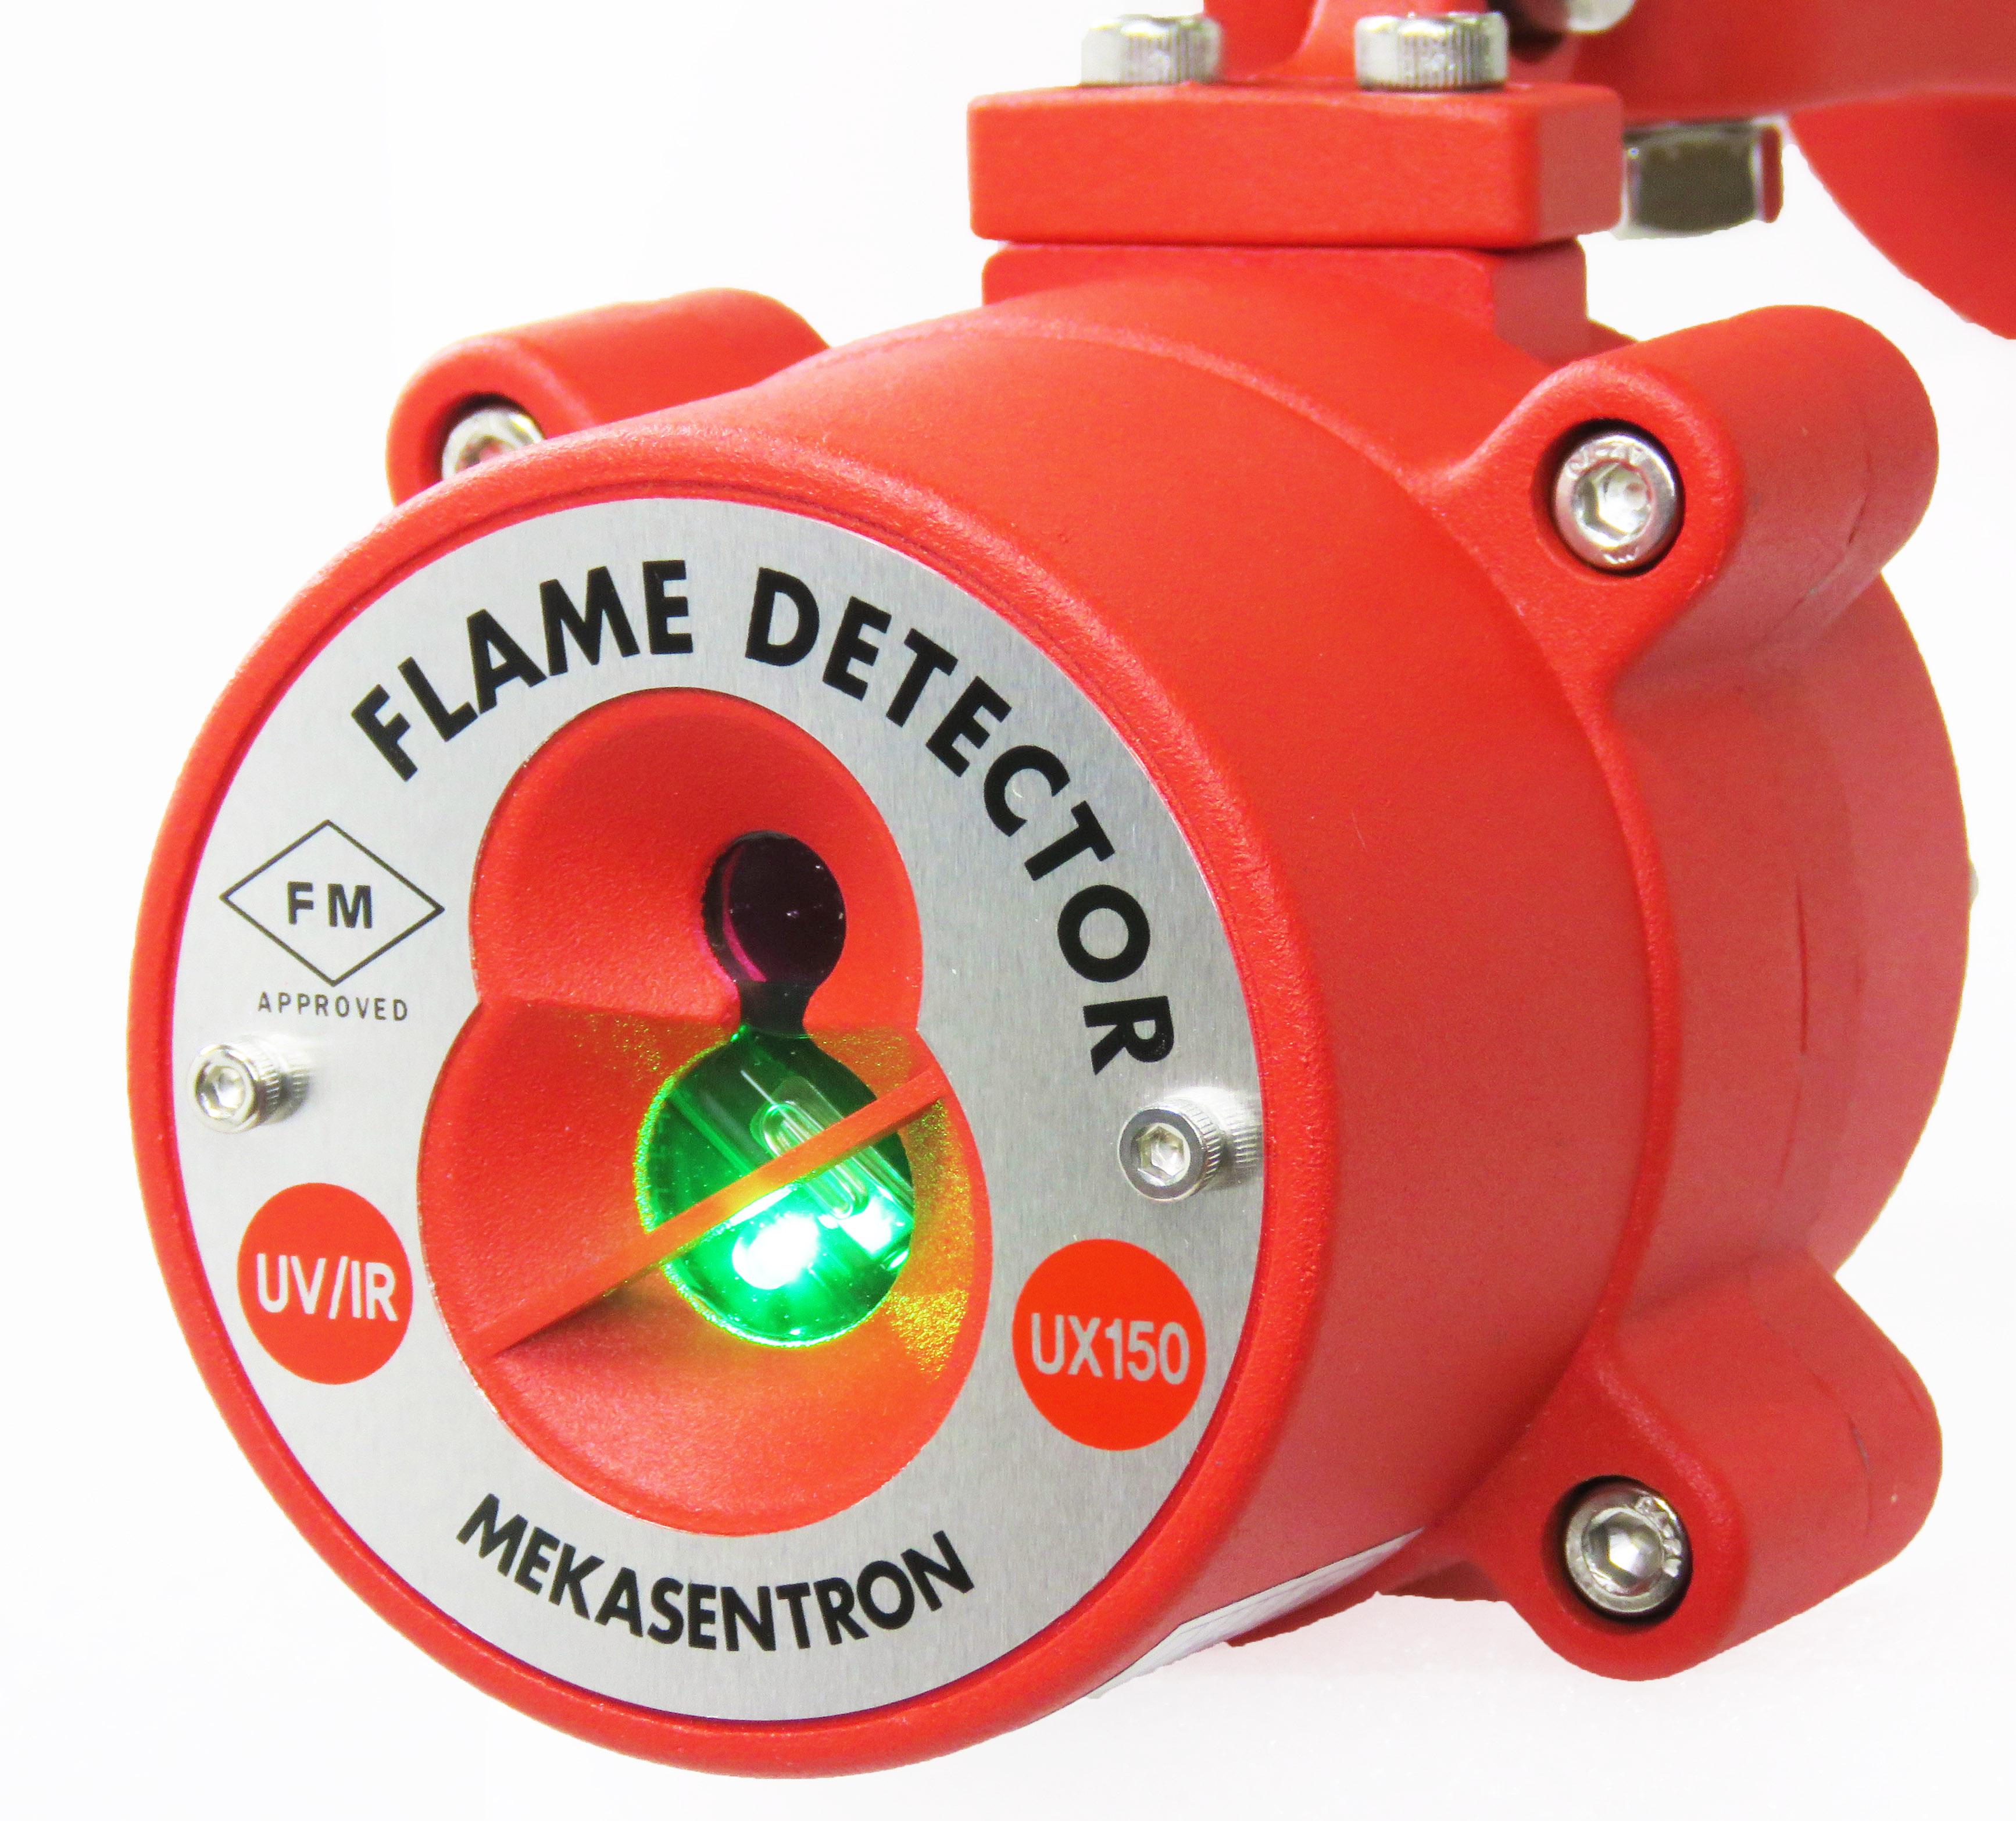 Flame detector, UX150